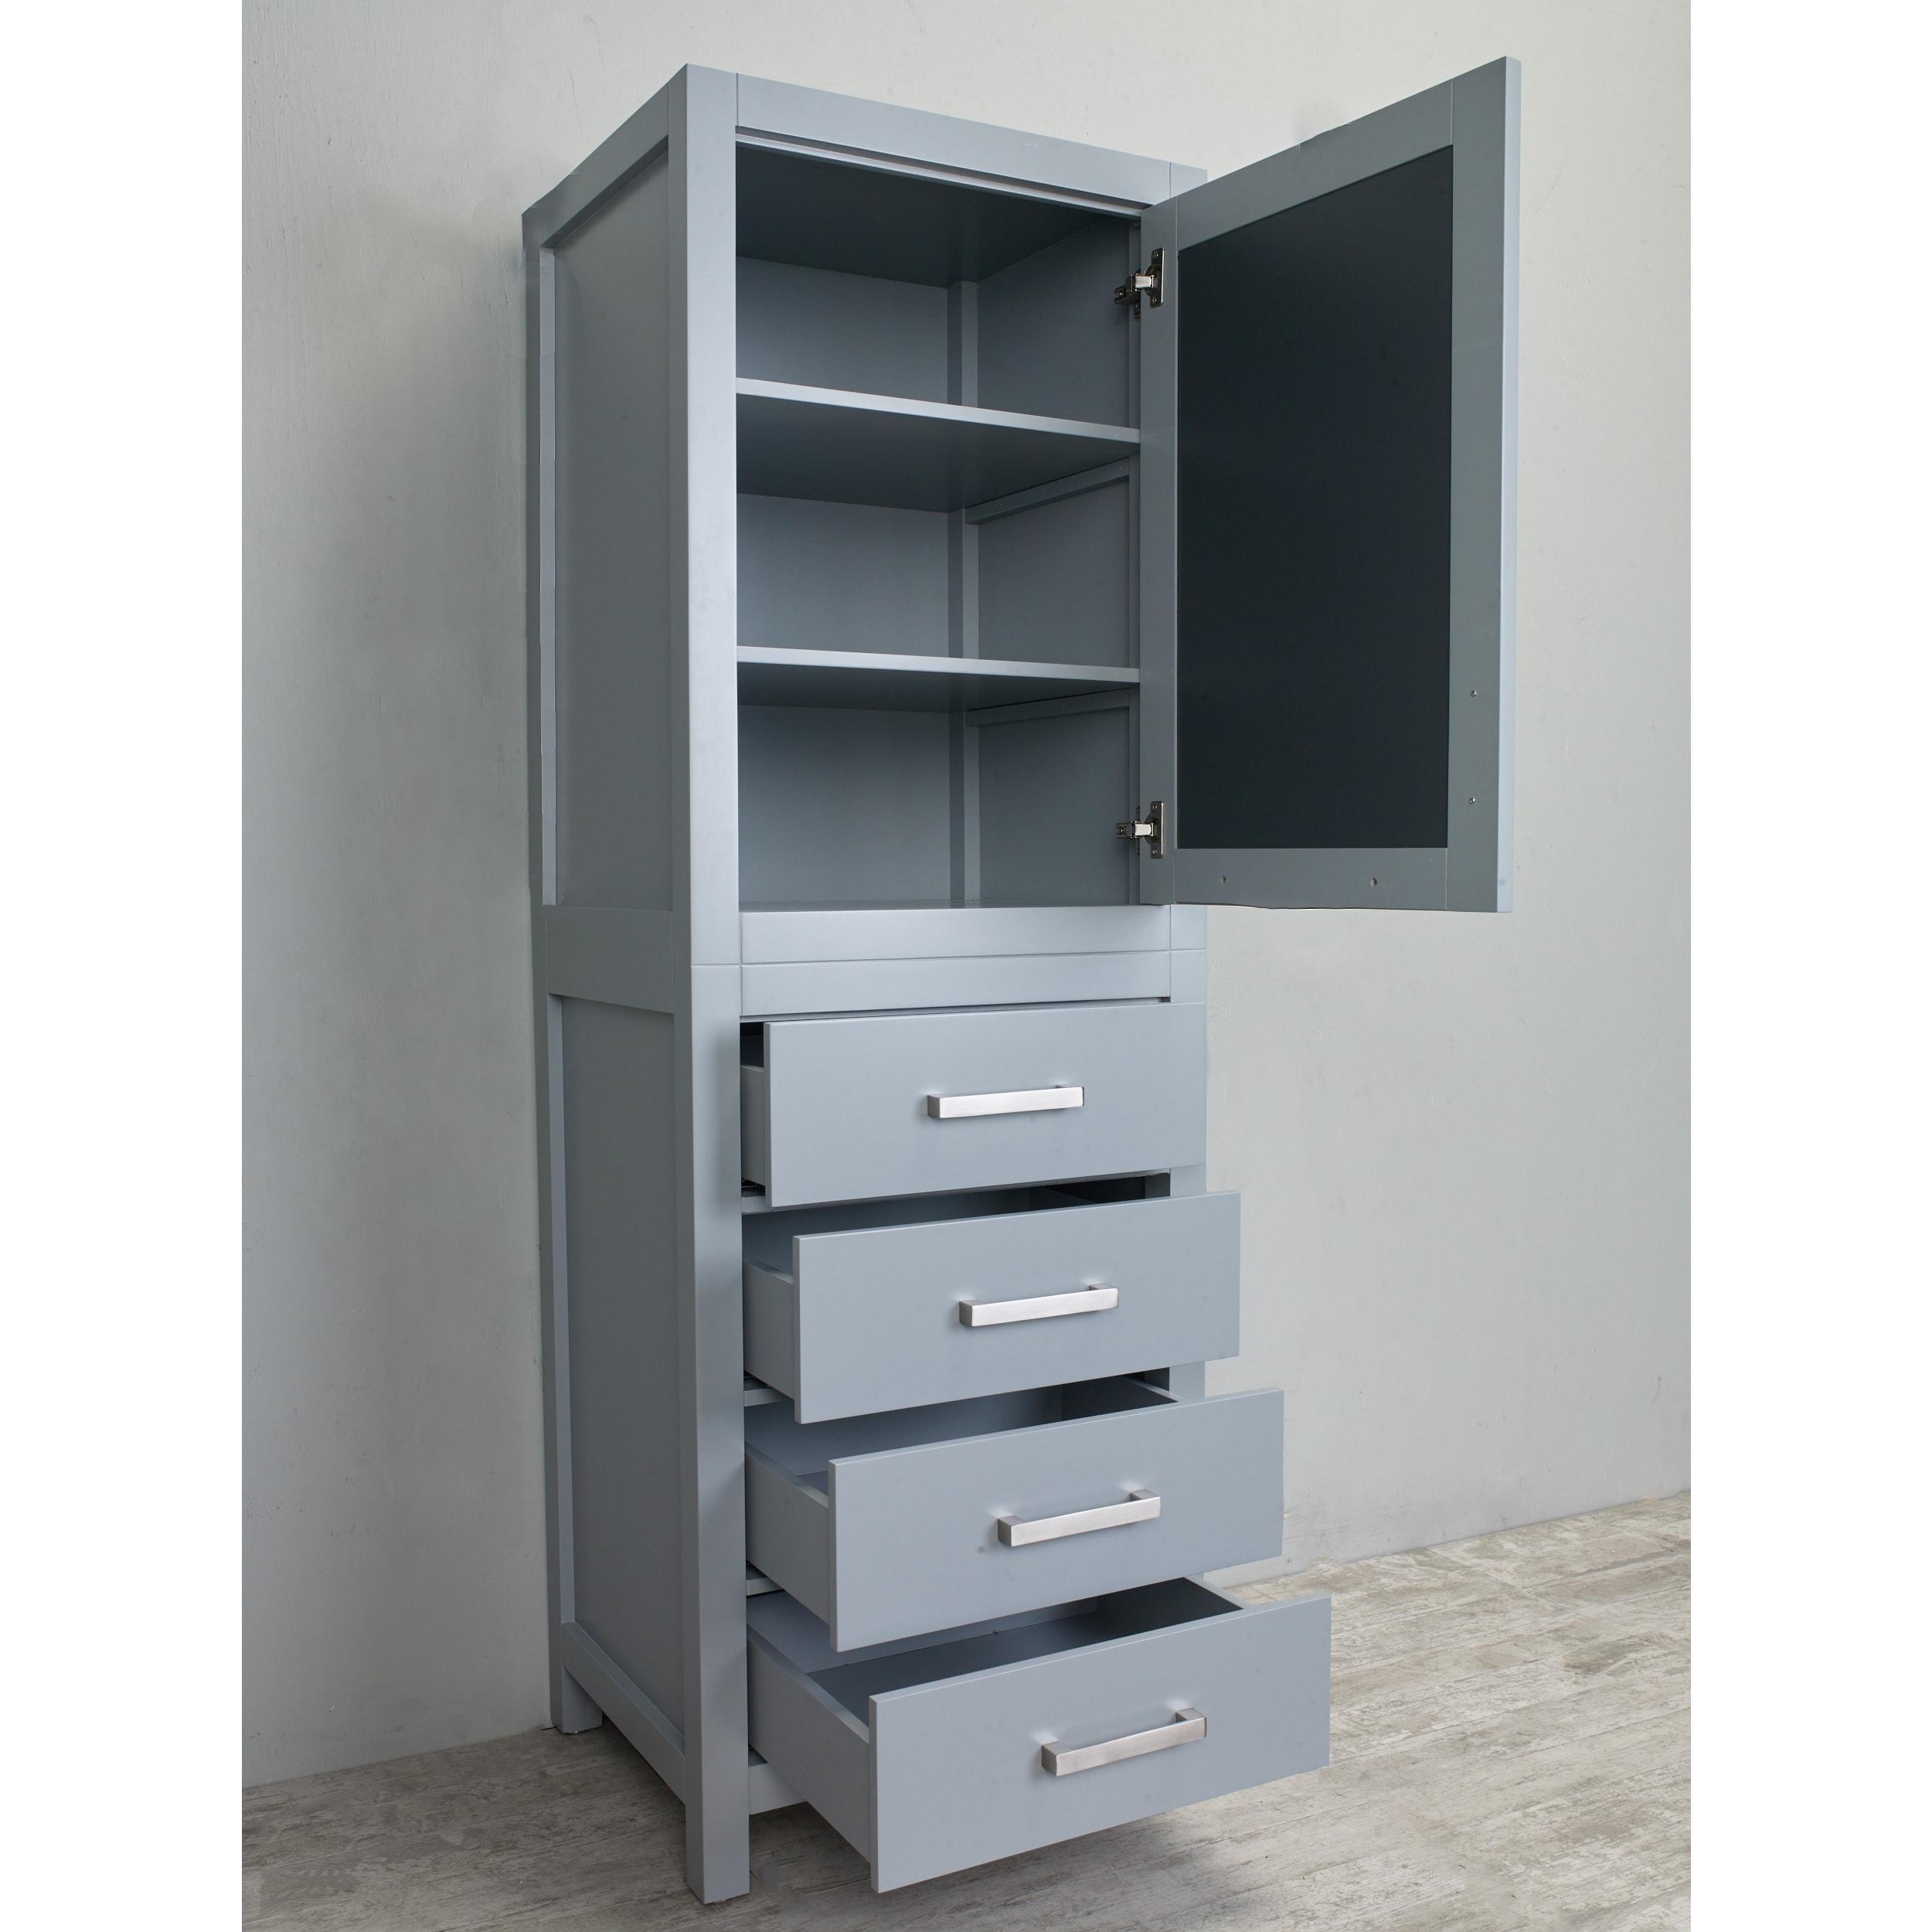 Shop Eviva New York 24-inch Grey Side/Linen Bathroom Cabinet Storage ...